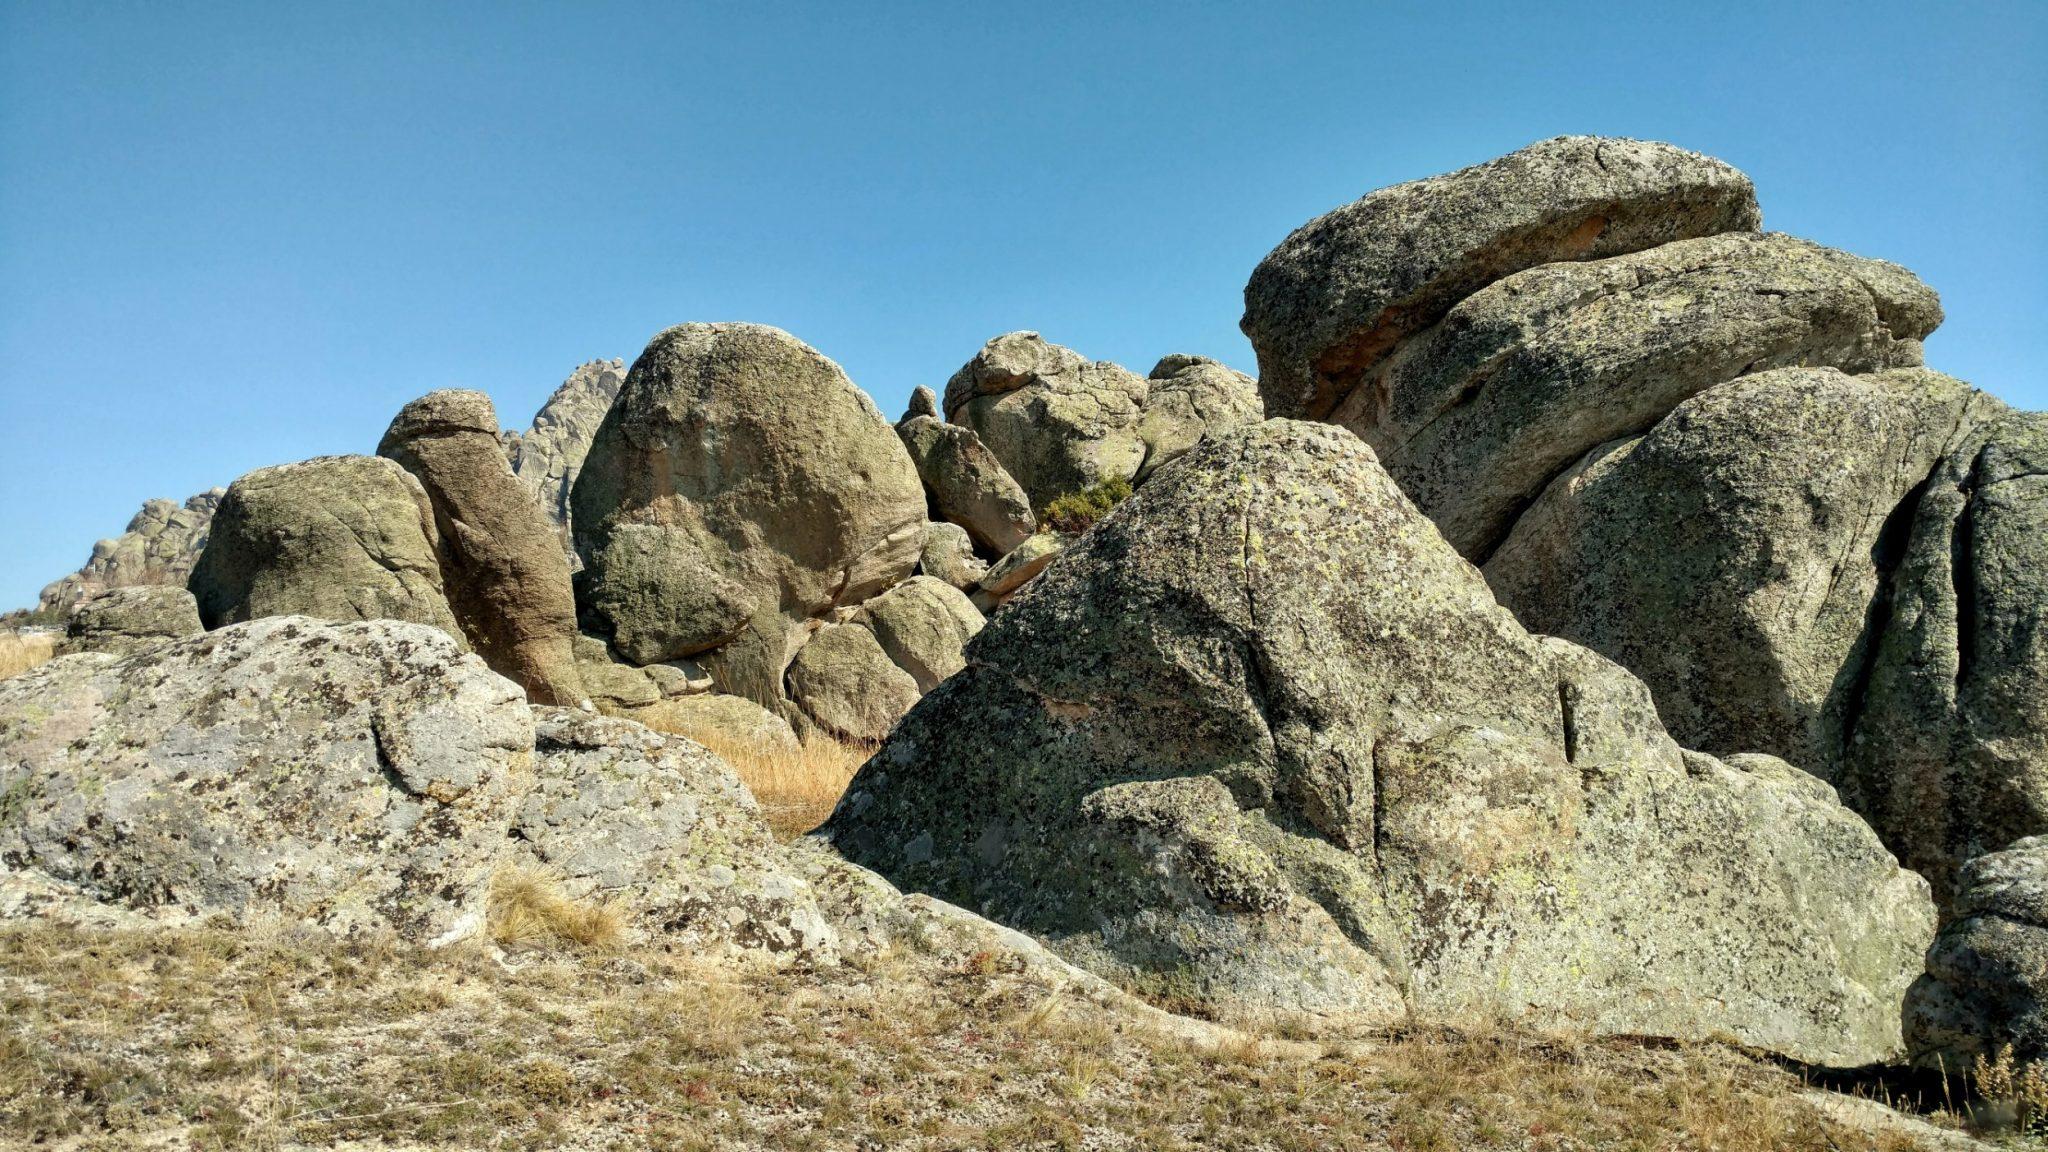 Boulderlifestyle Prilep